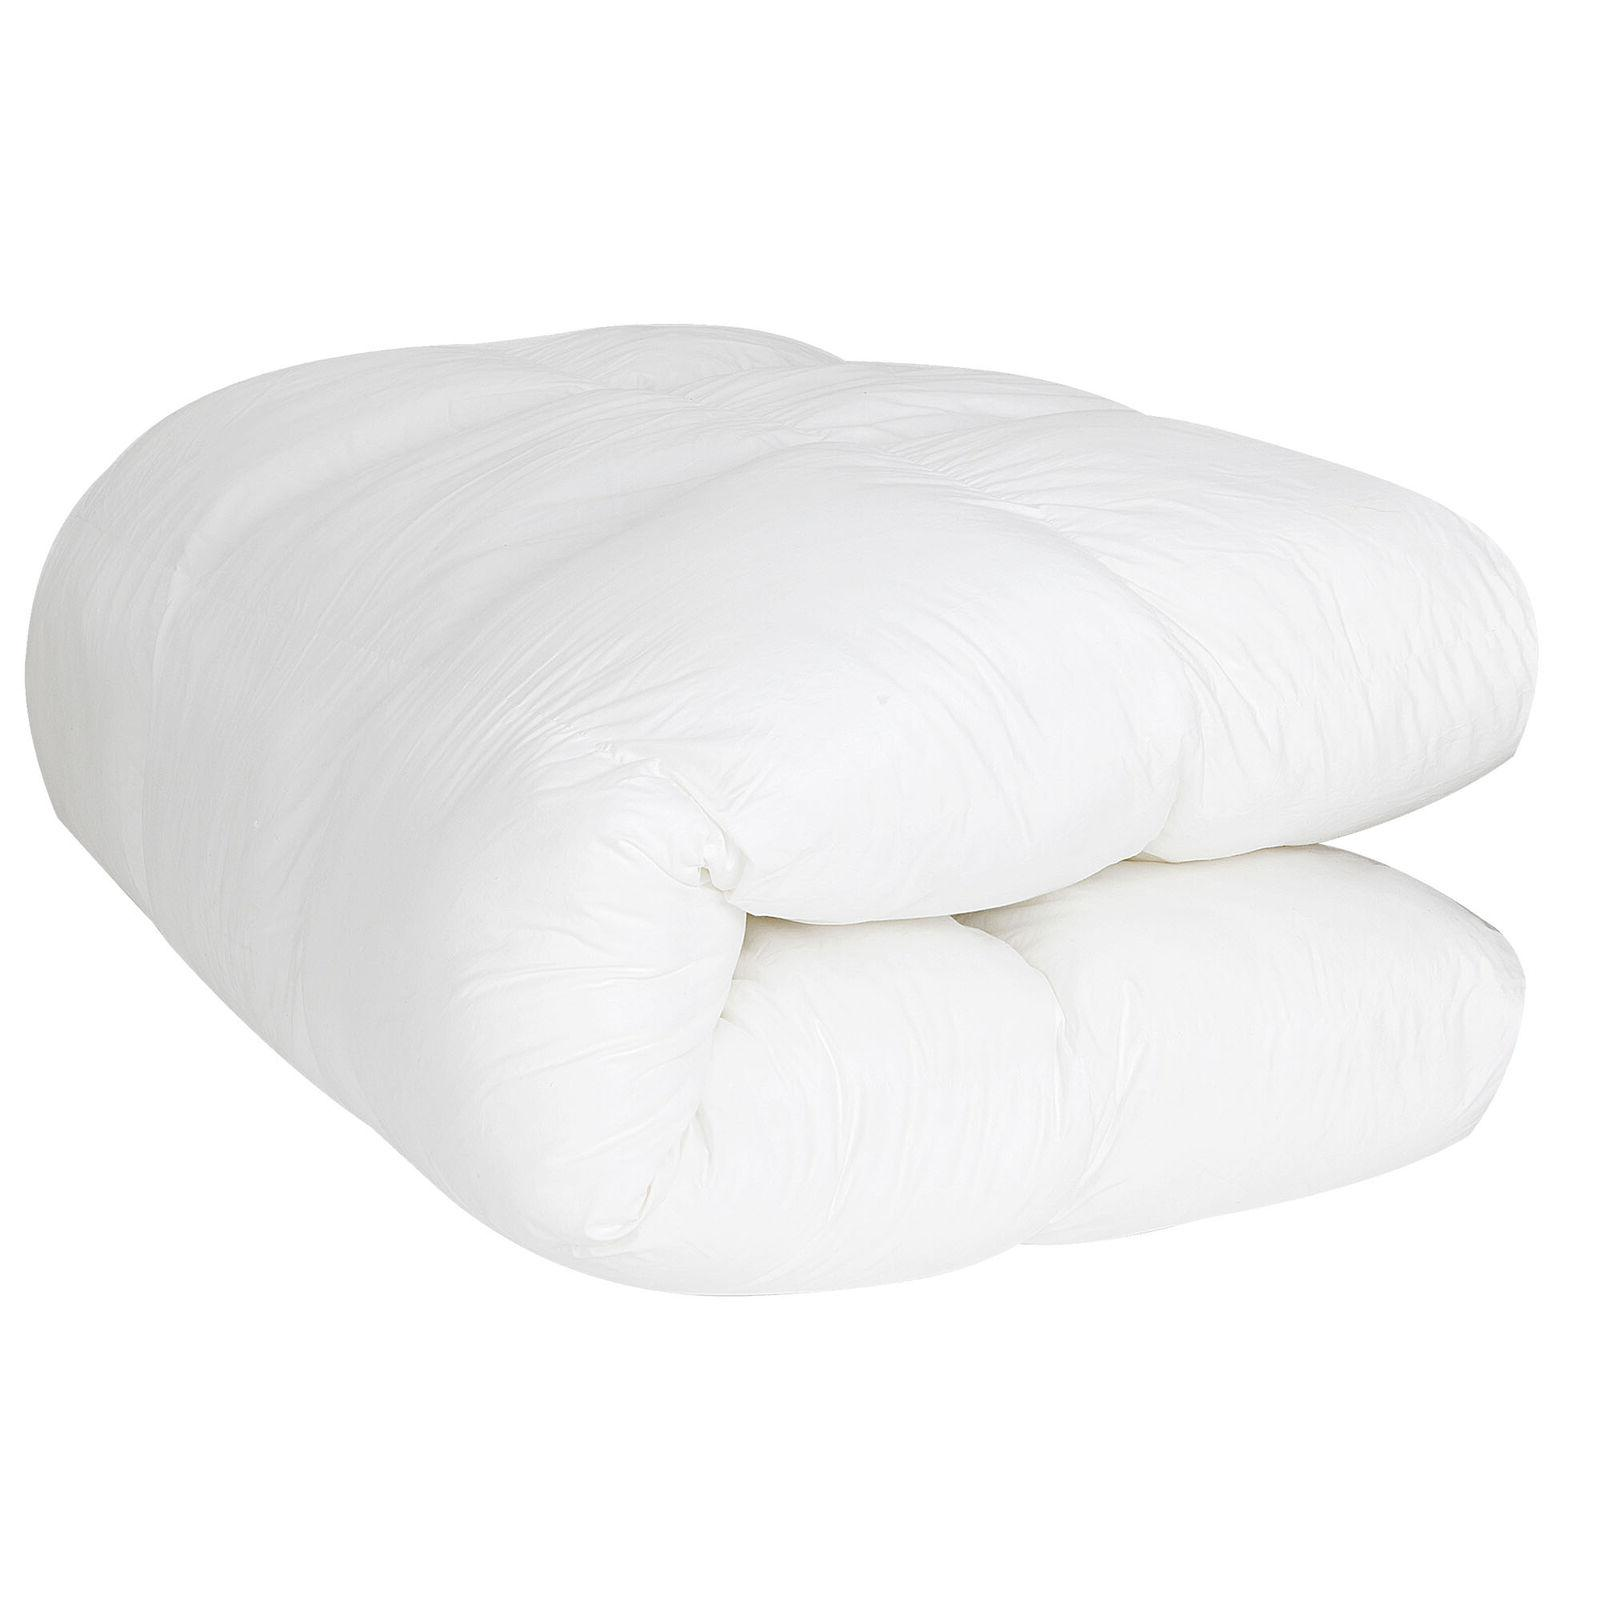 mattress bed pillow top pad cover memory